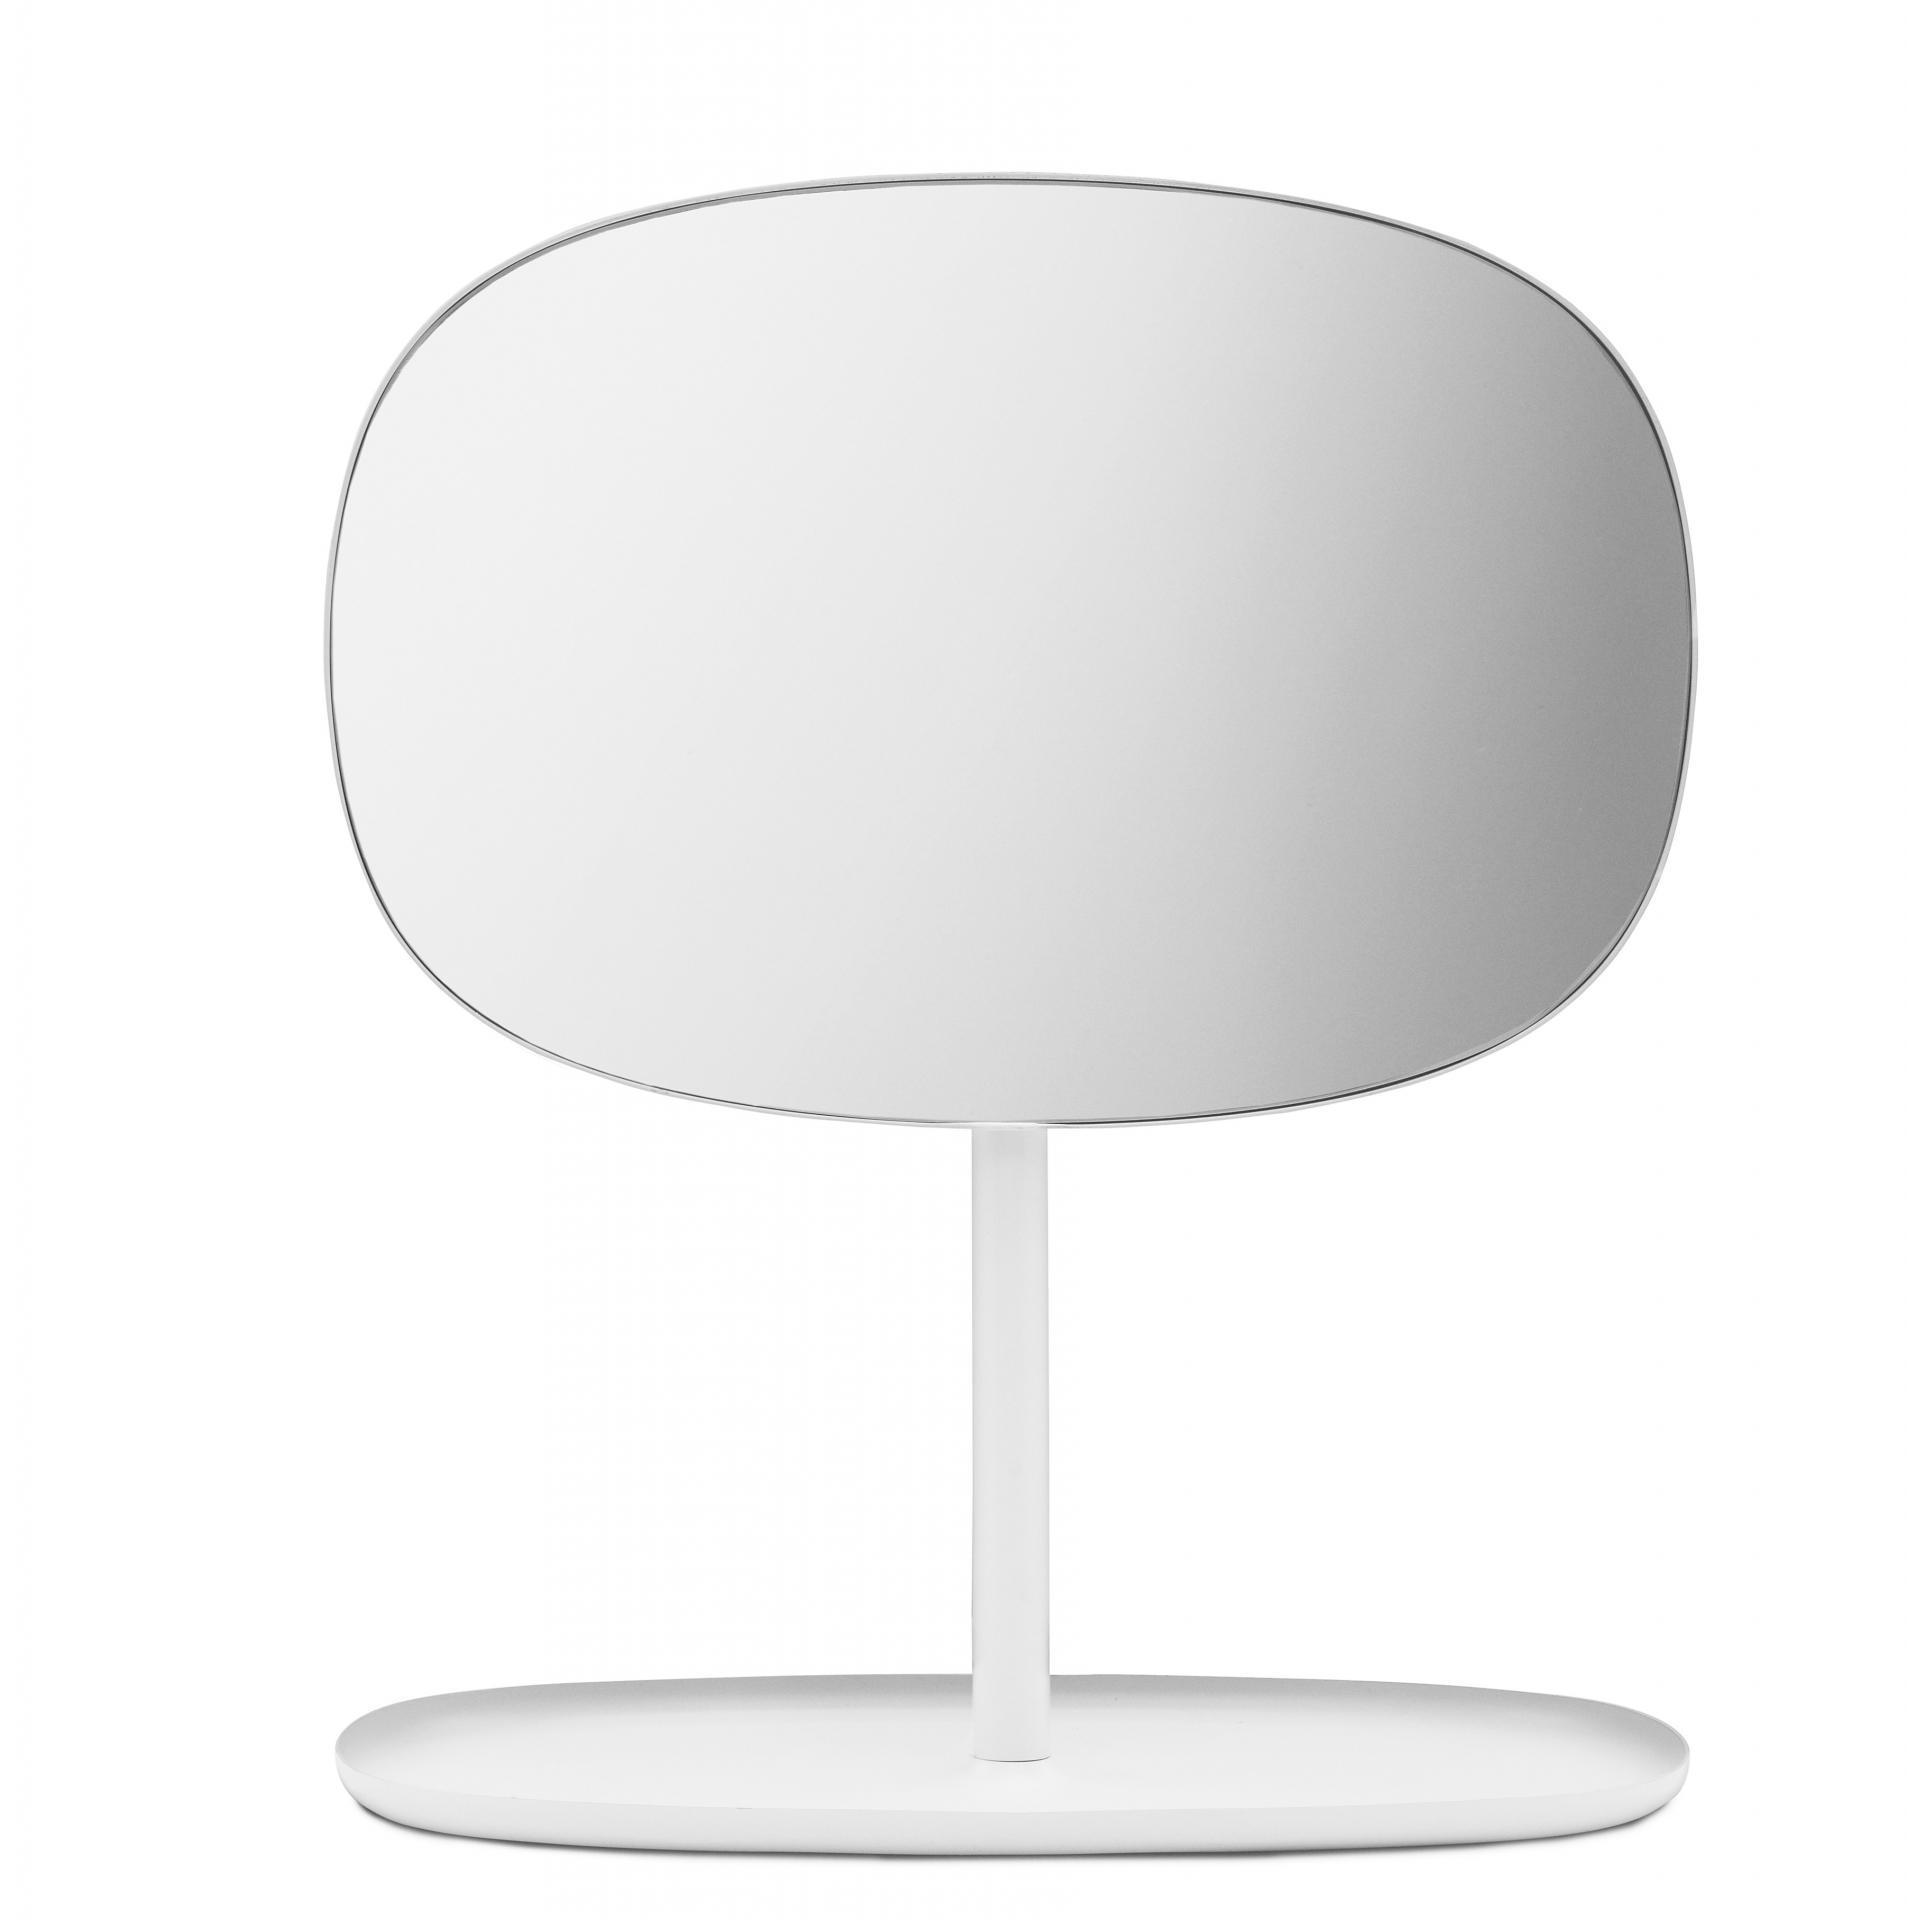 normann COPENHAGEN Stolní zrcadlo White, čirá barva, sklo, kov